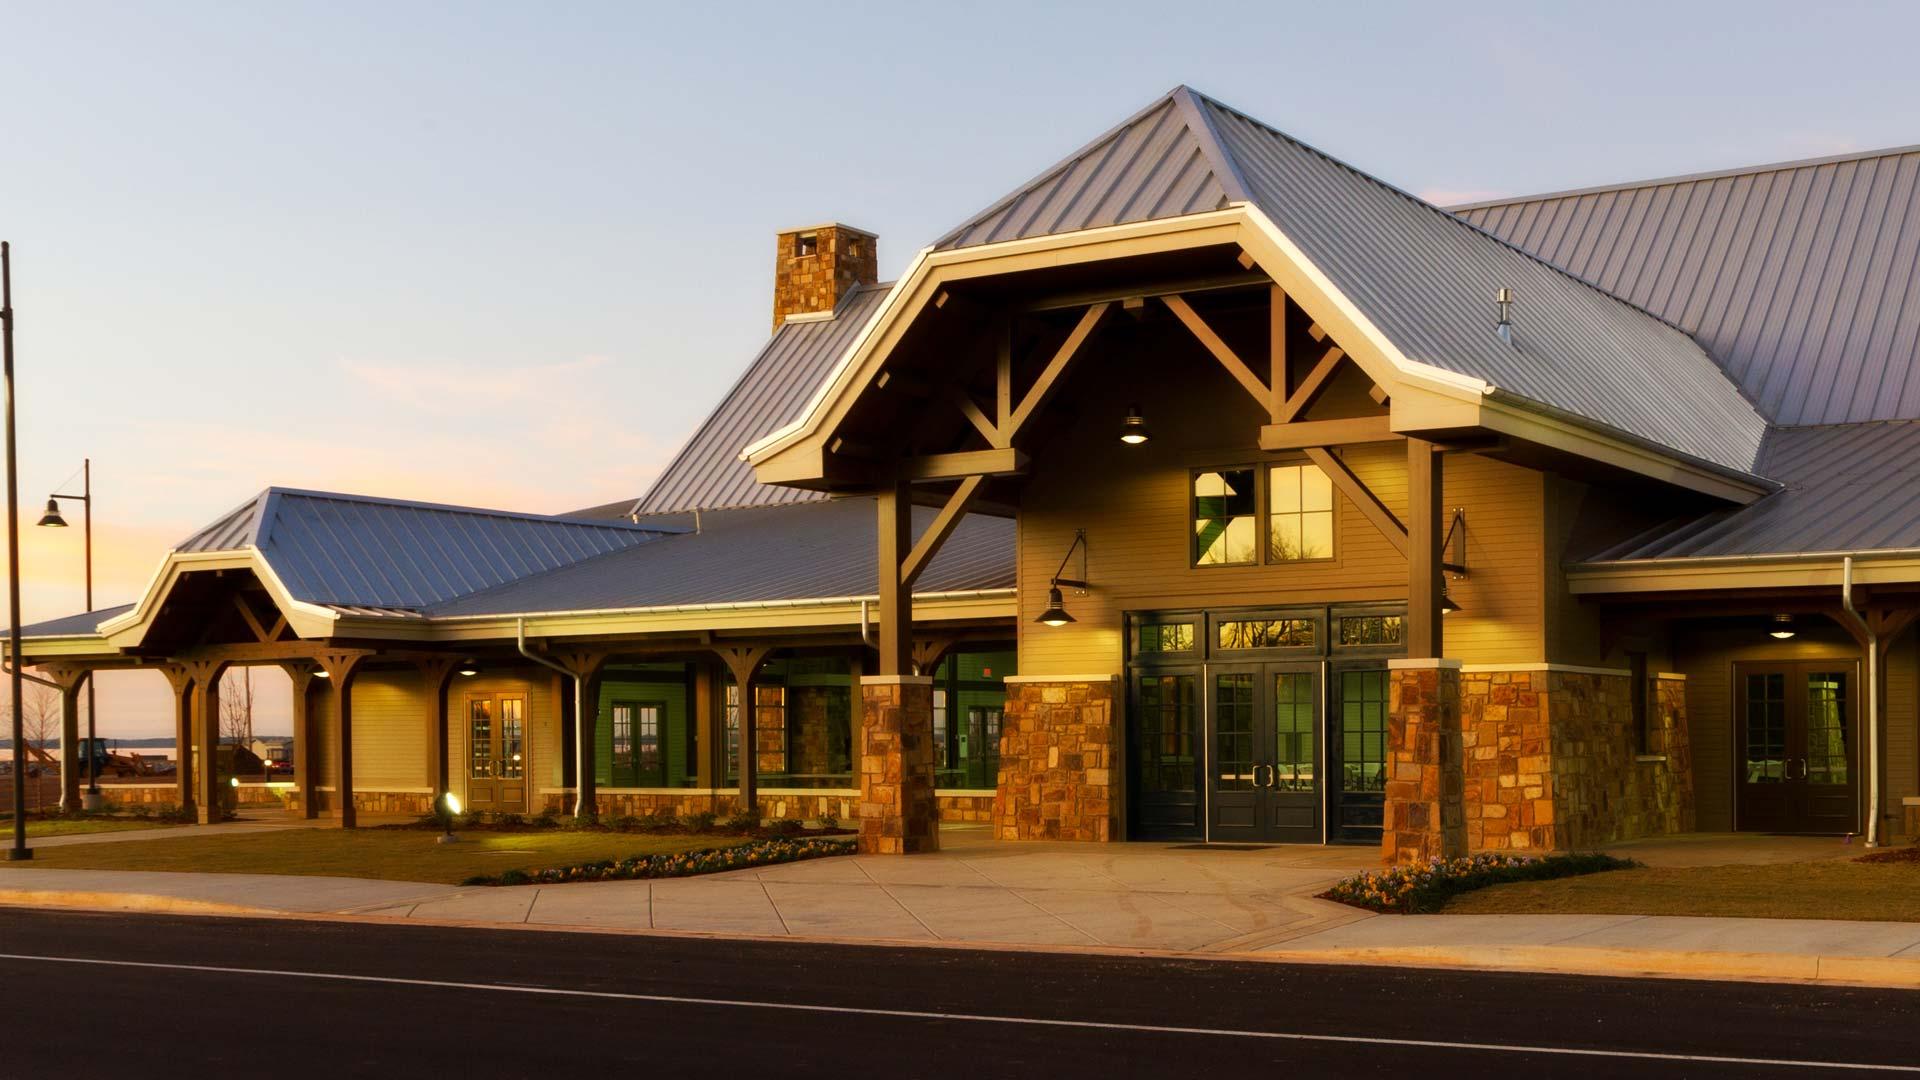 Ingalls Harbor Pavilion